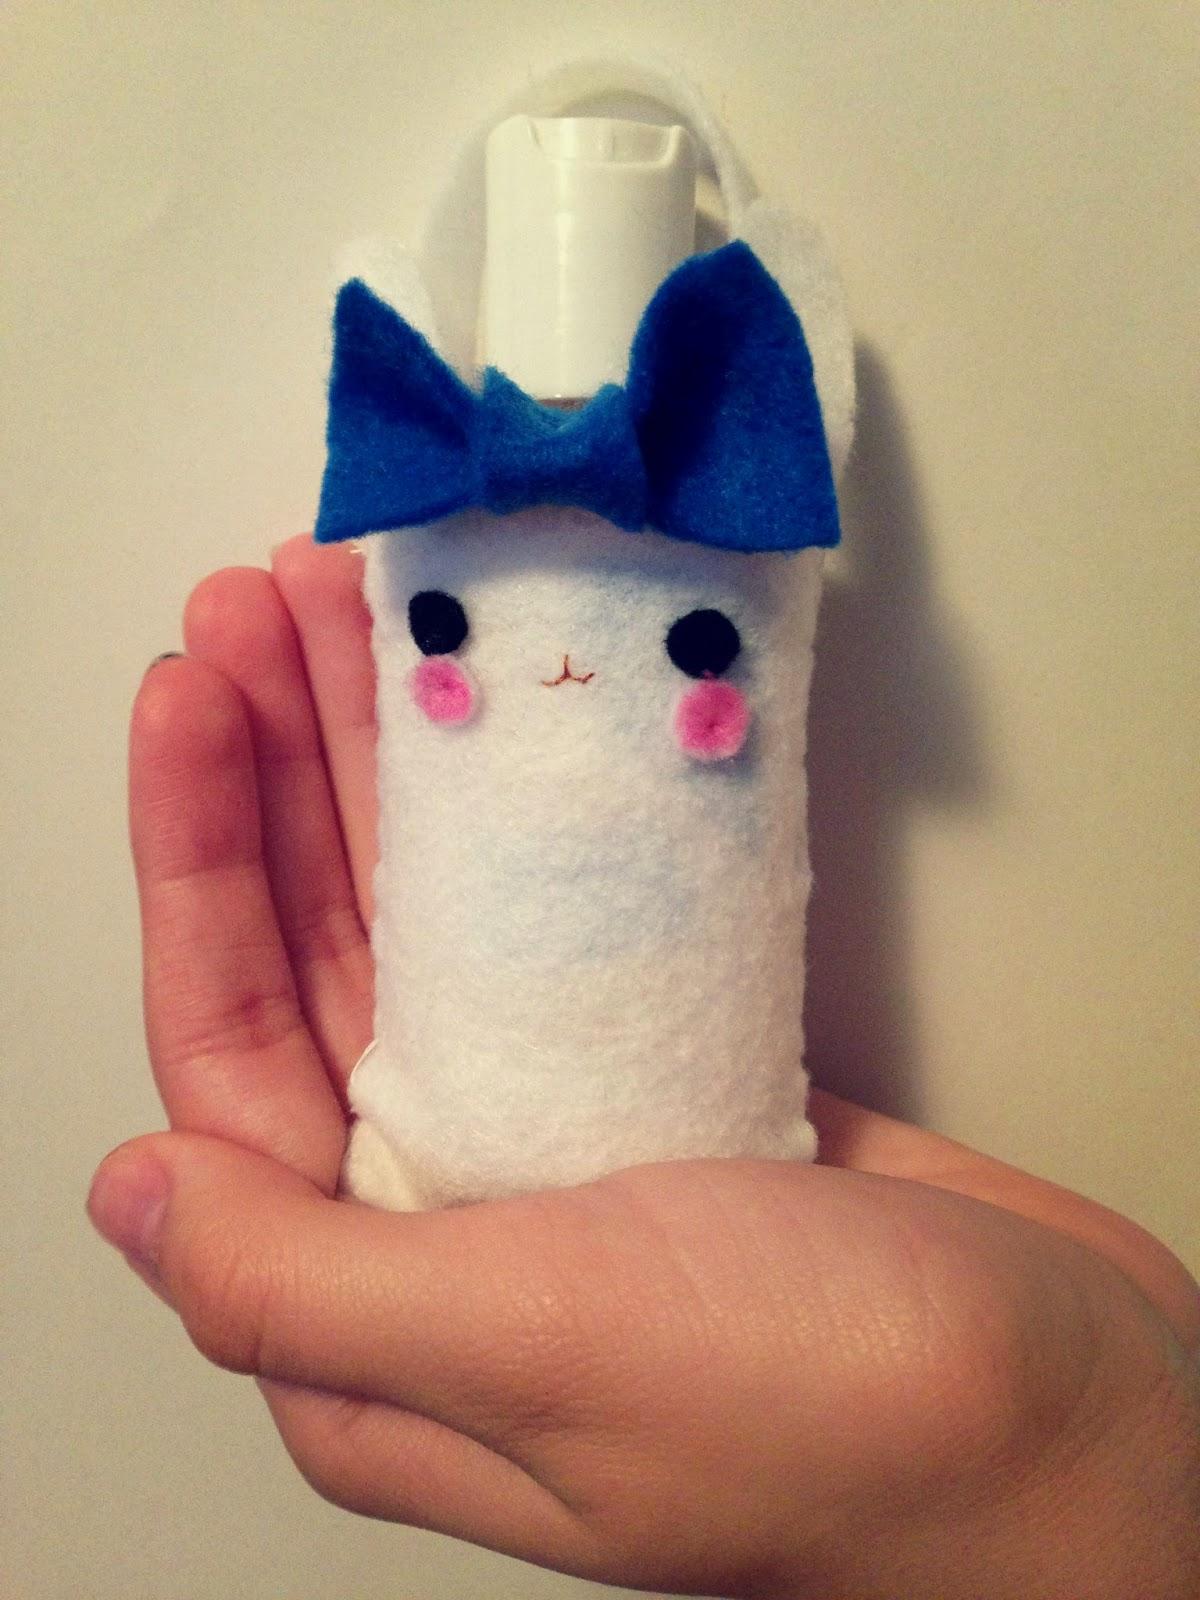 Cute Bunny Hand Sanatizer Holder